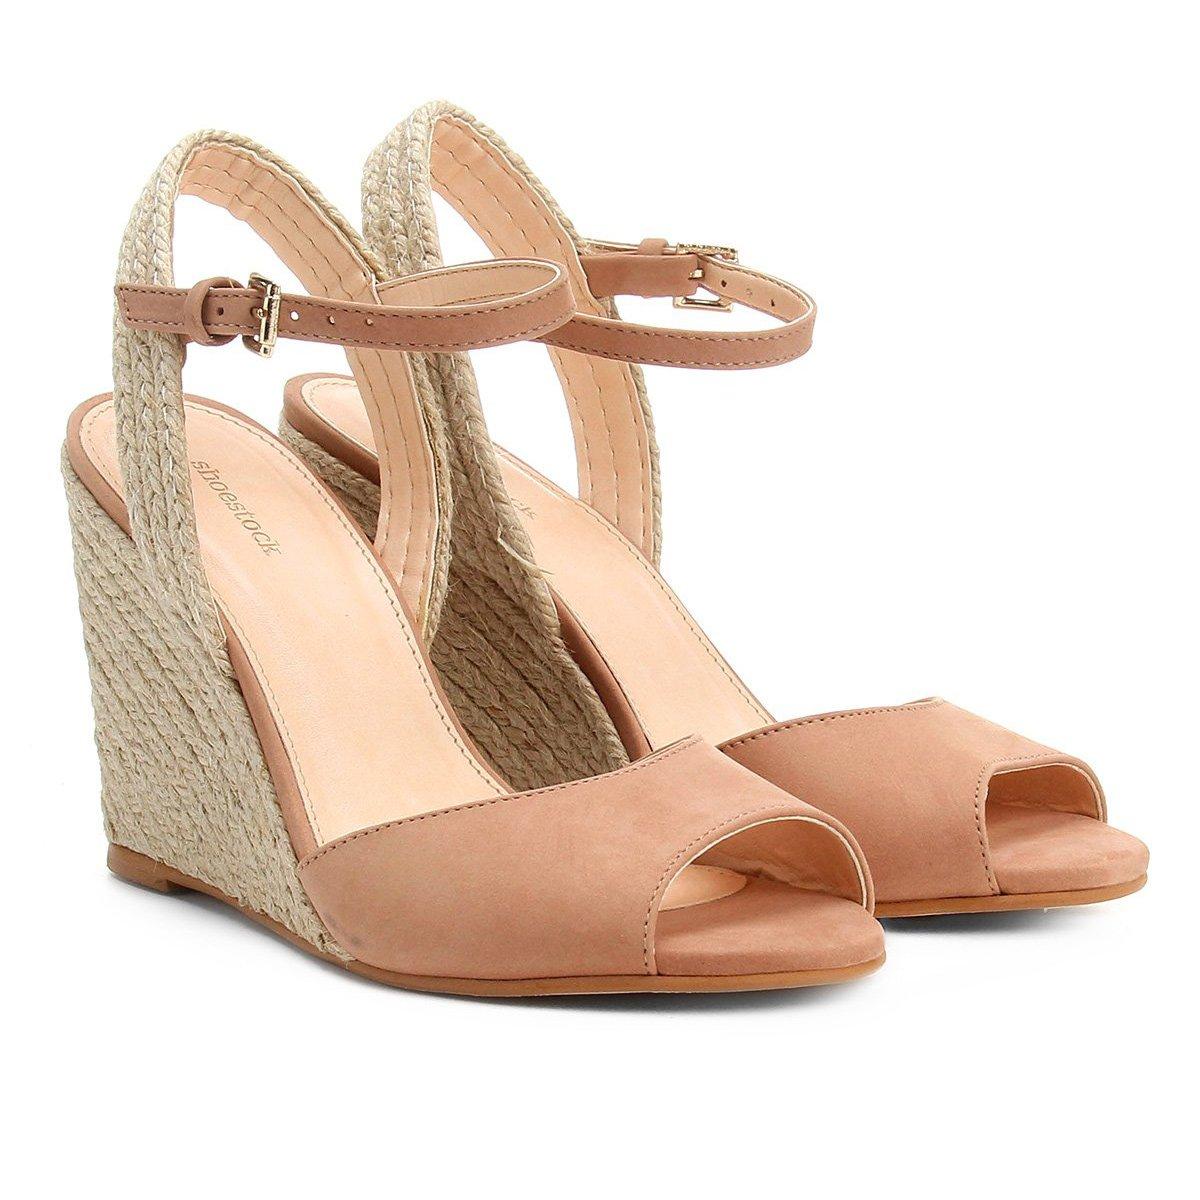 21581c6daf Sandália Anabela Couro Shoestock Corda Feminina   Shoestock